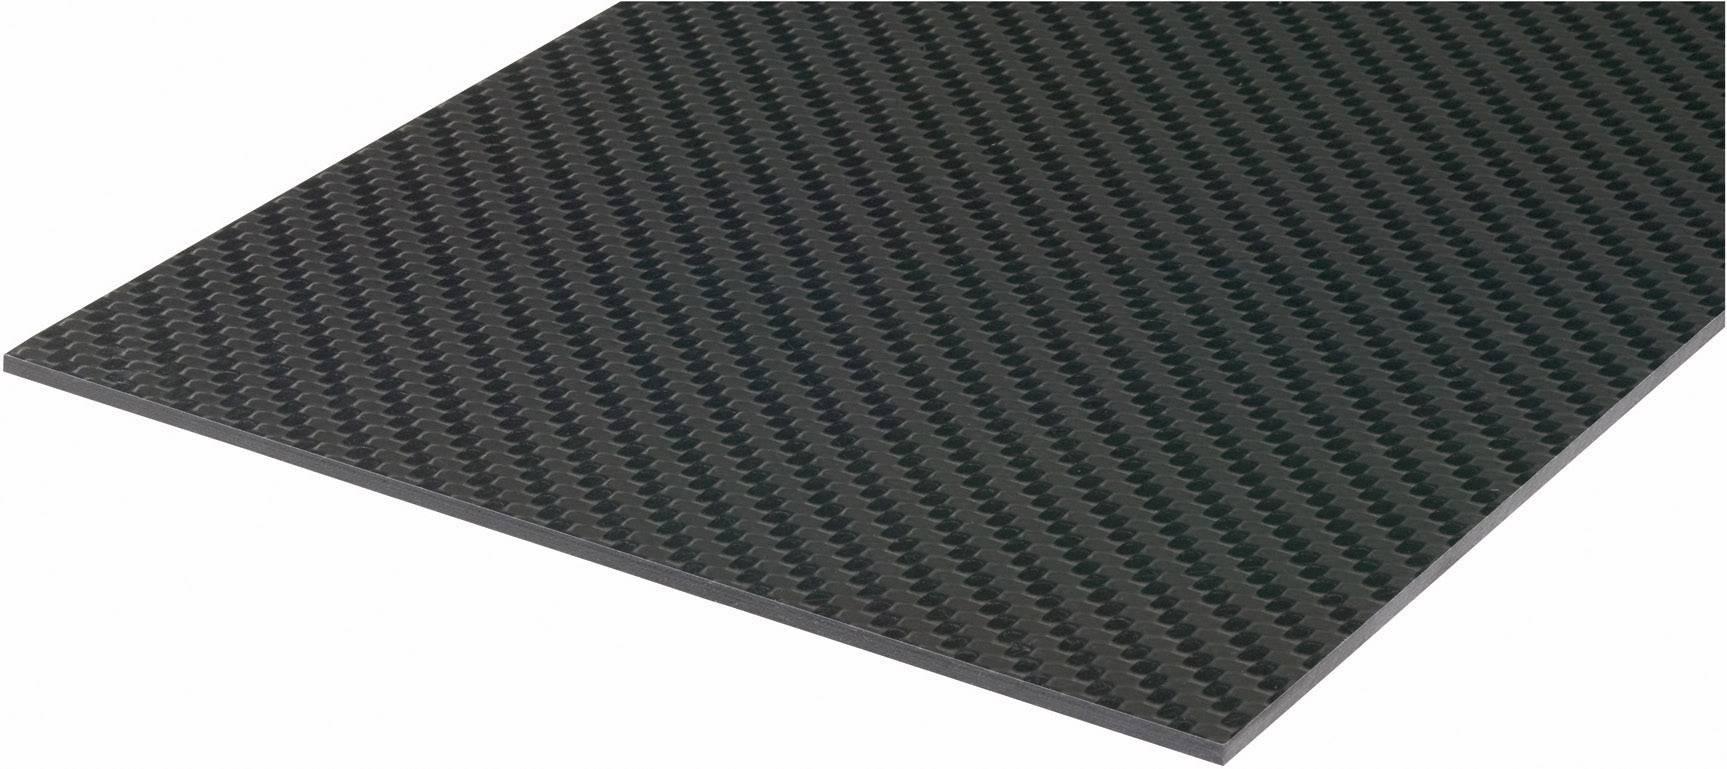 Uhlíková prepreg deska Carbotec 229917, (d x š) 340 mm x 150 mm x 2 mm